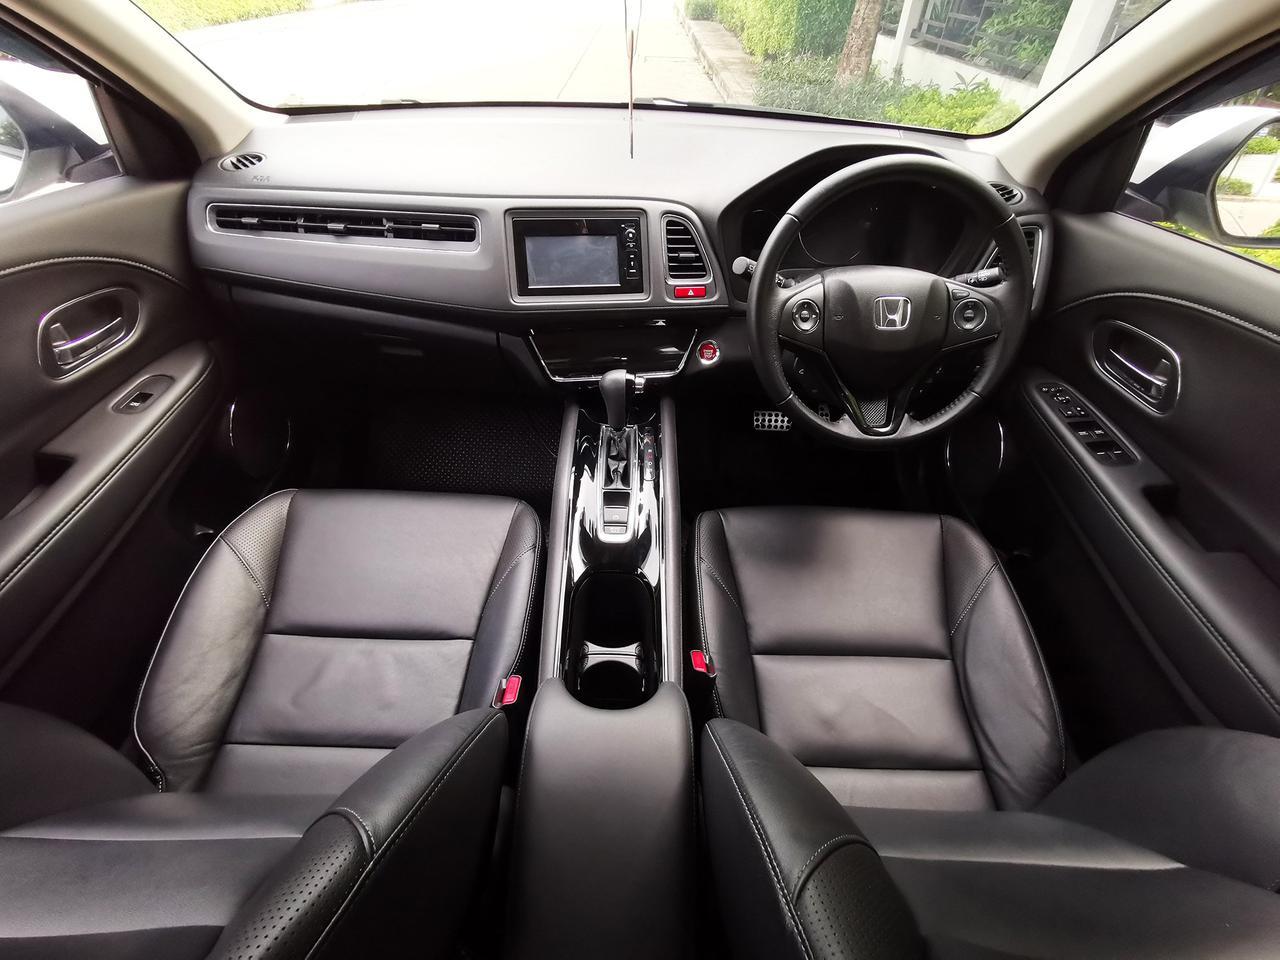 Honda HR-V 1.8 E Limited (ปี 2018) SUV AT รูปที่ 5